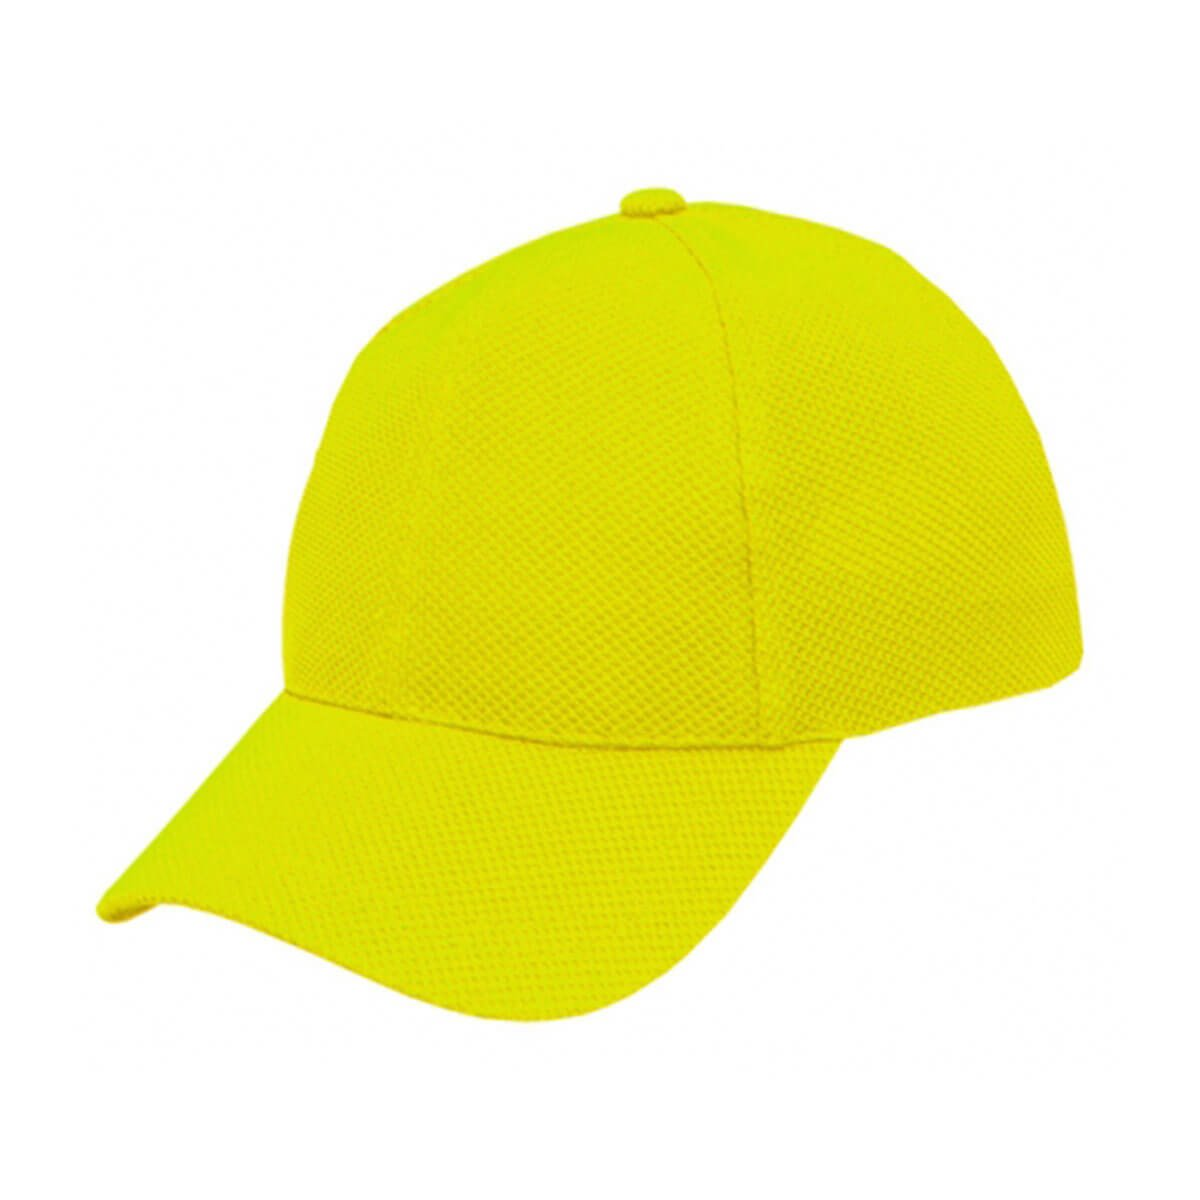 PQ Mesh Plain Sandwich Design Cap-Fluro Yellow